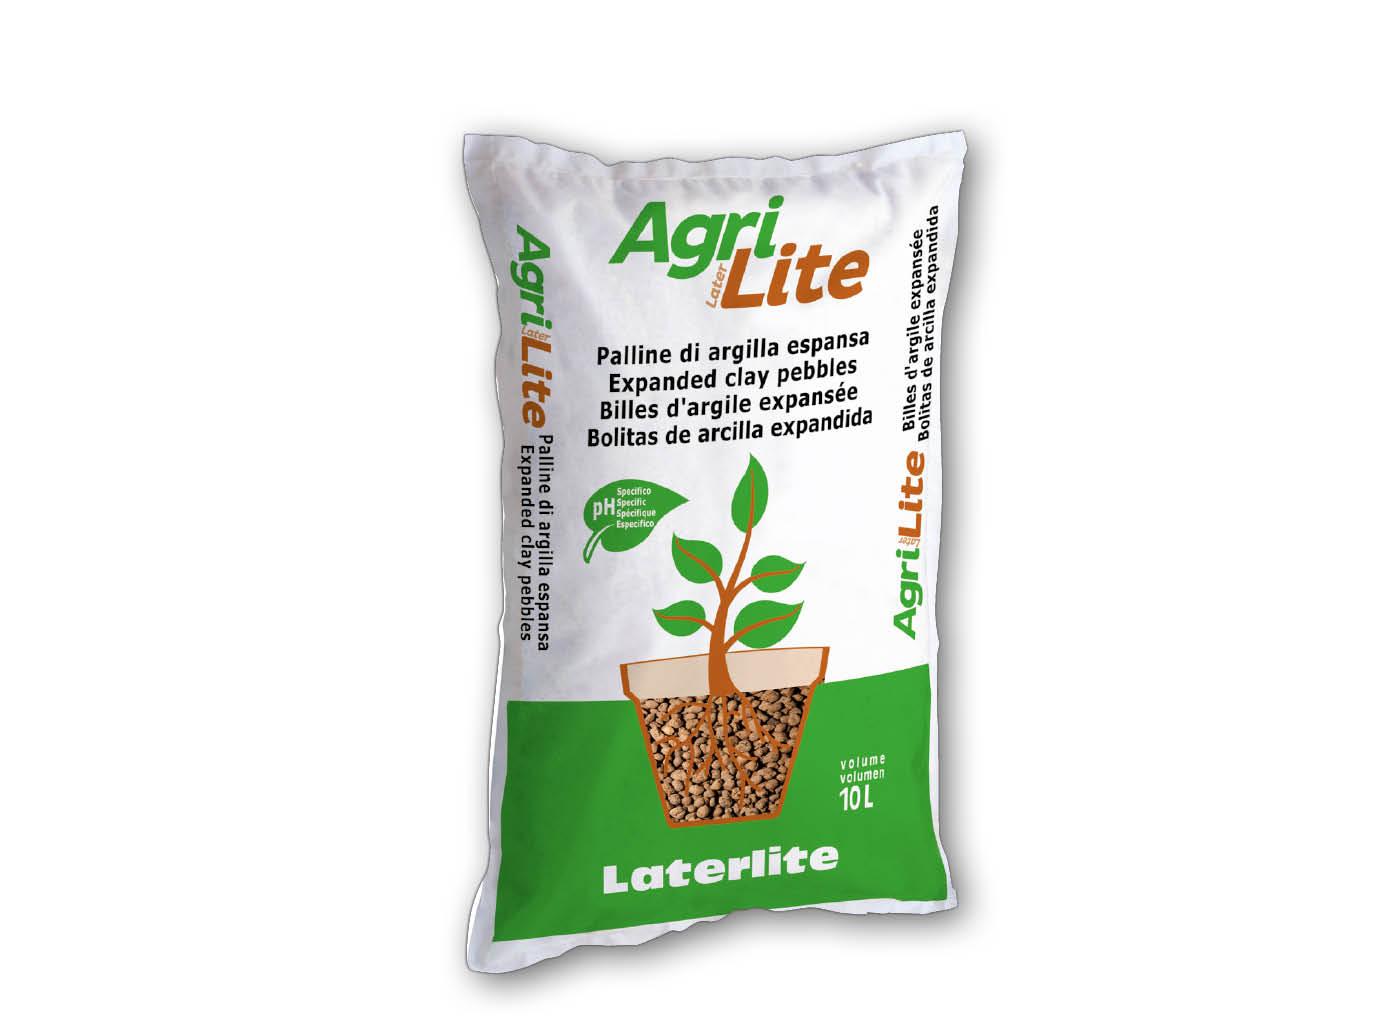 sacco-agrilaterlite-piante-vaso-P44-1